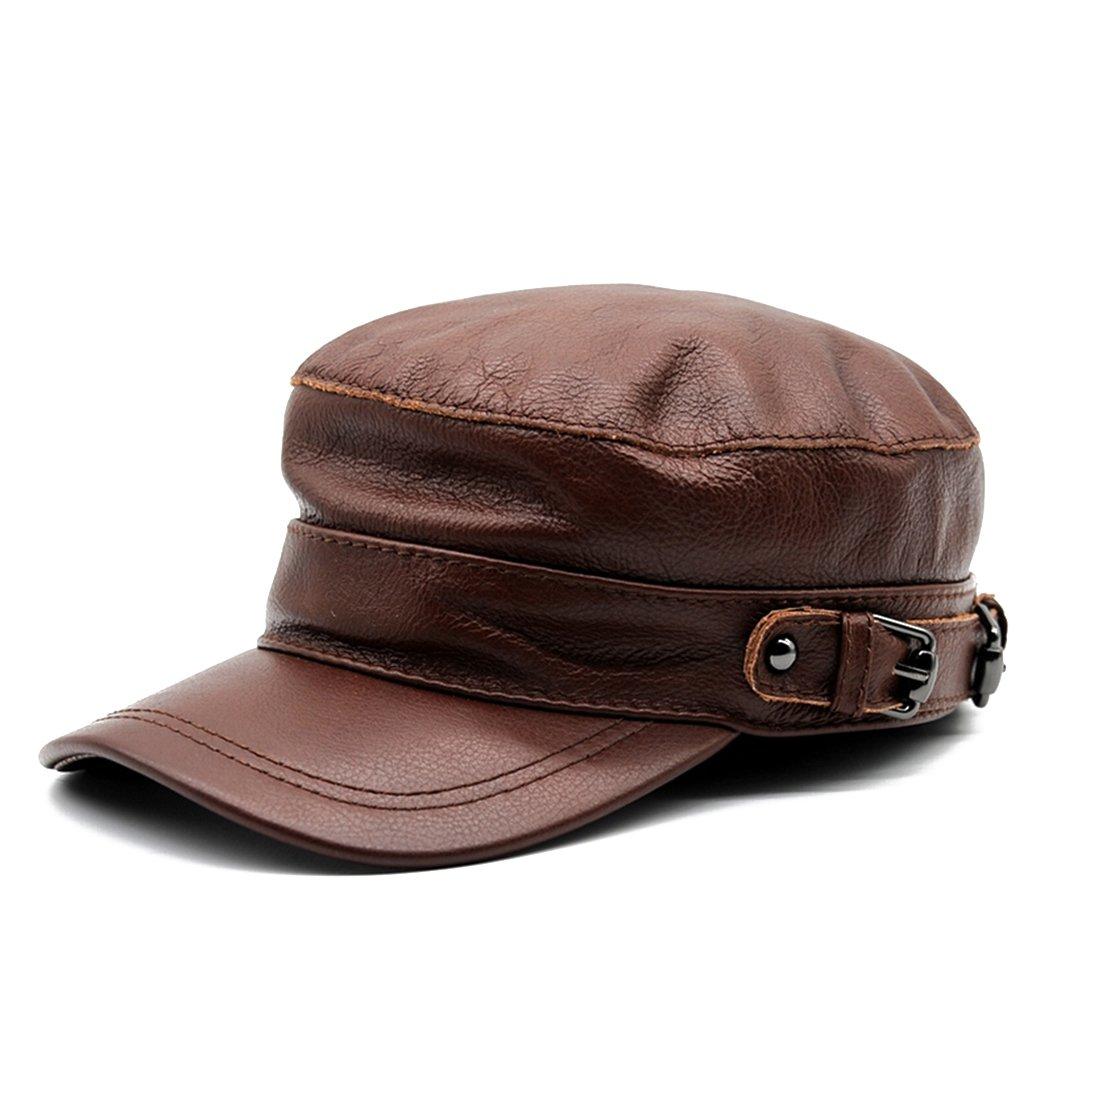 Maylian Fashion Genuine Leather Boy Baseball Hat Flat Top Cap Men